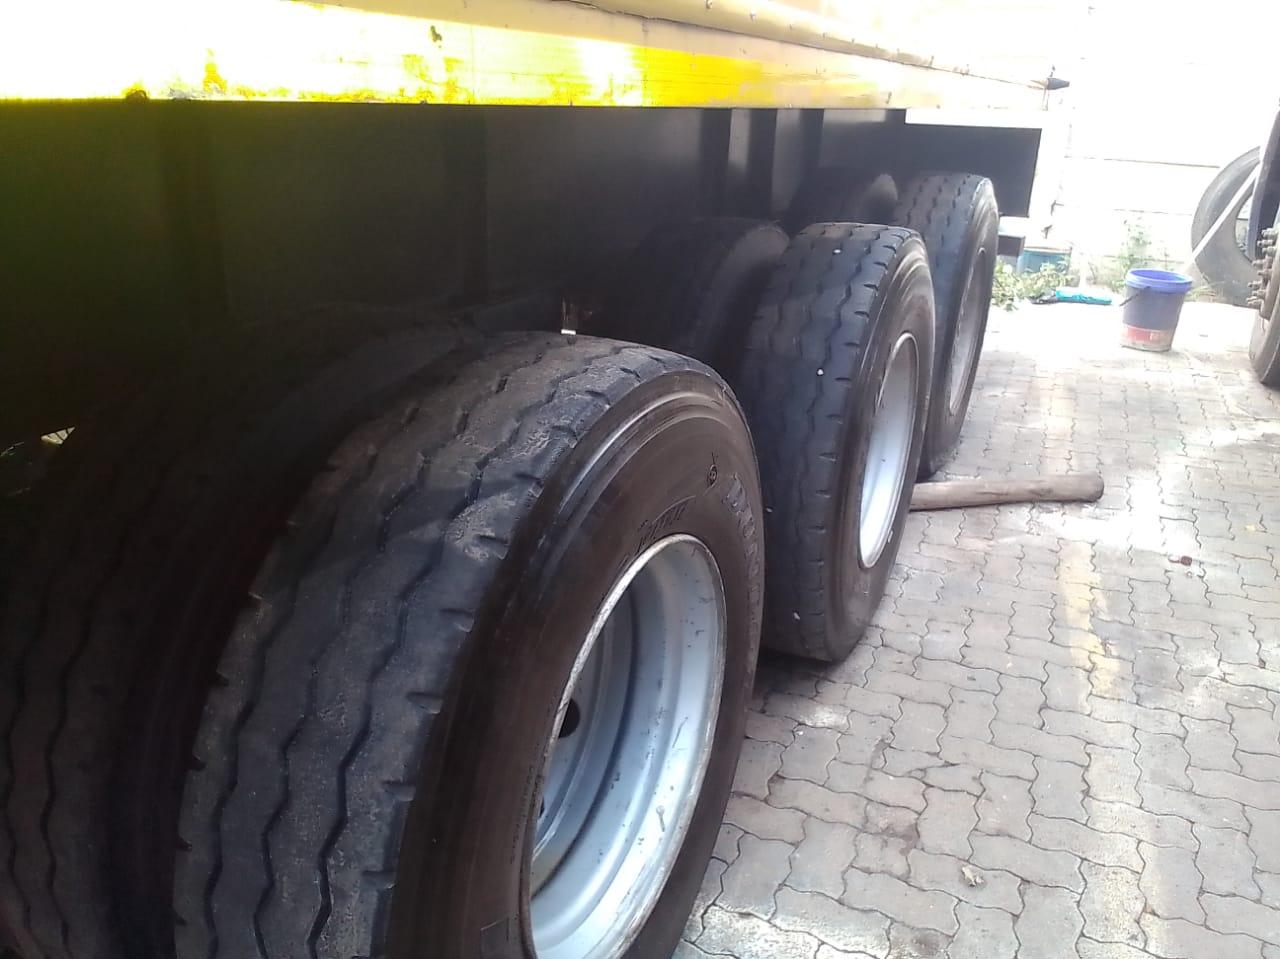 4 zelna 2004 model 15m Box trailers for sale